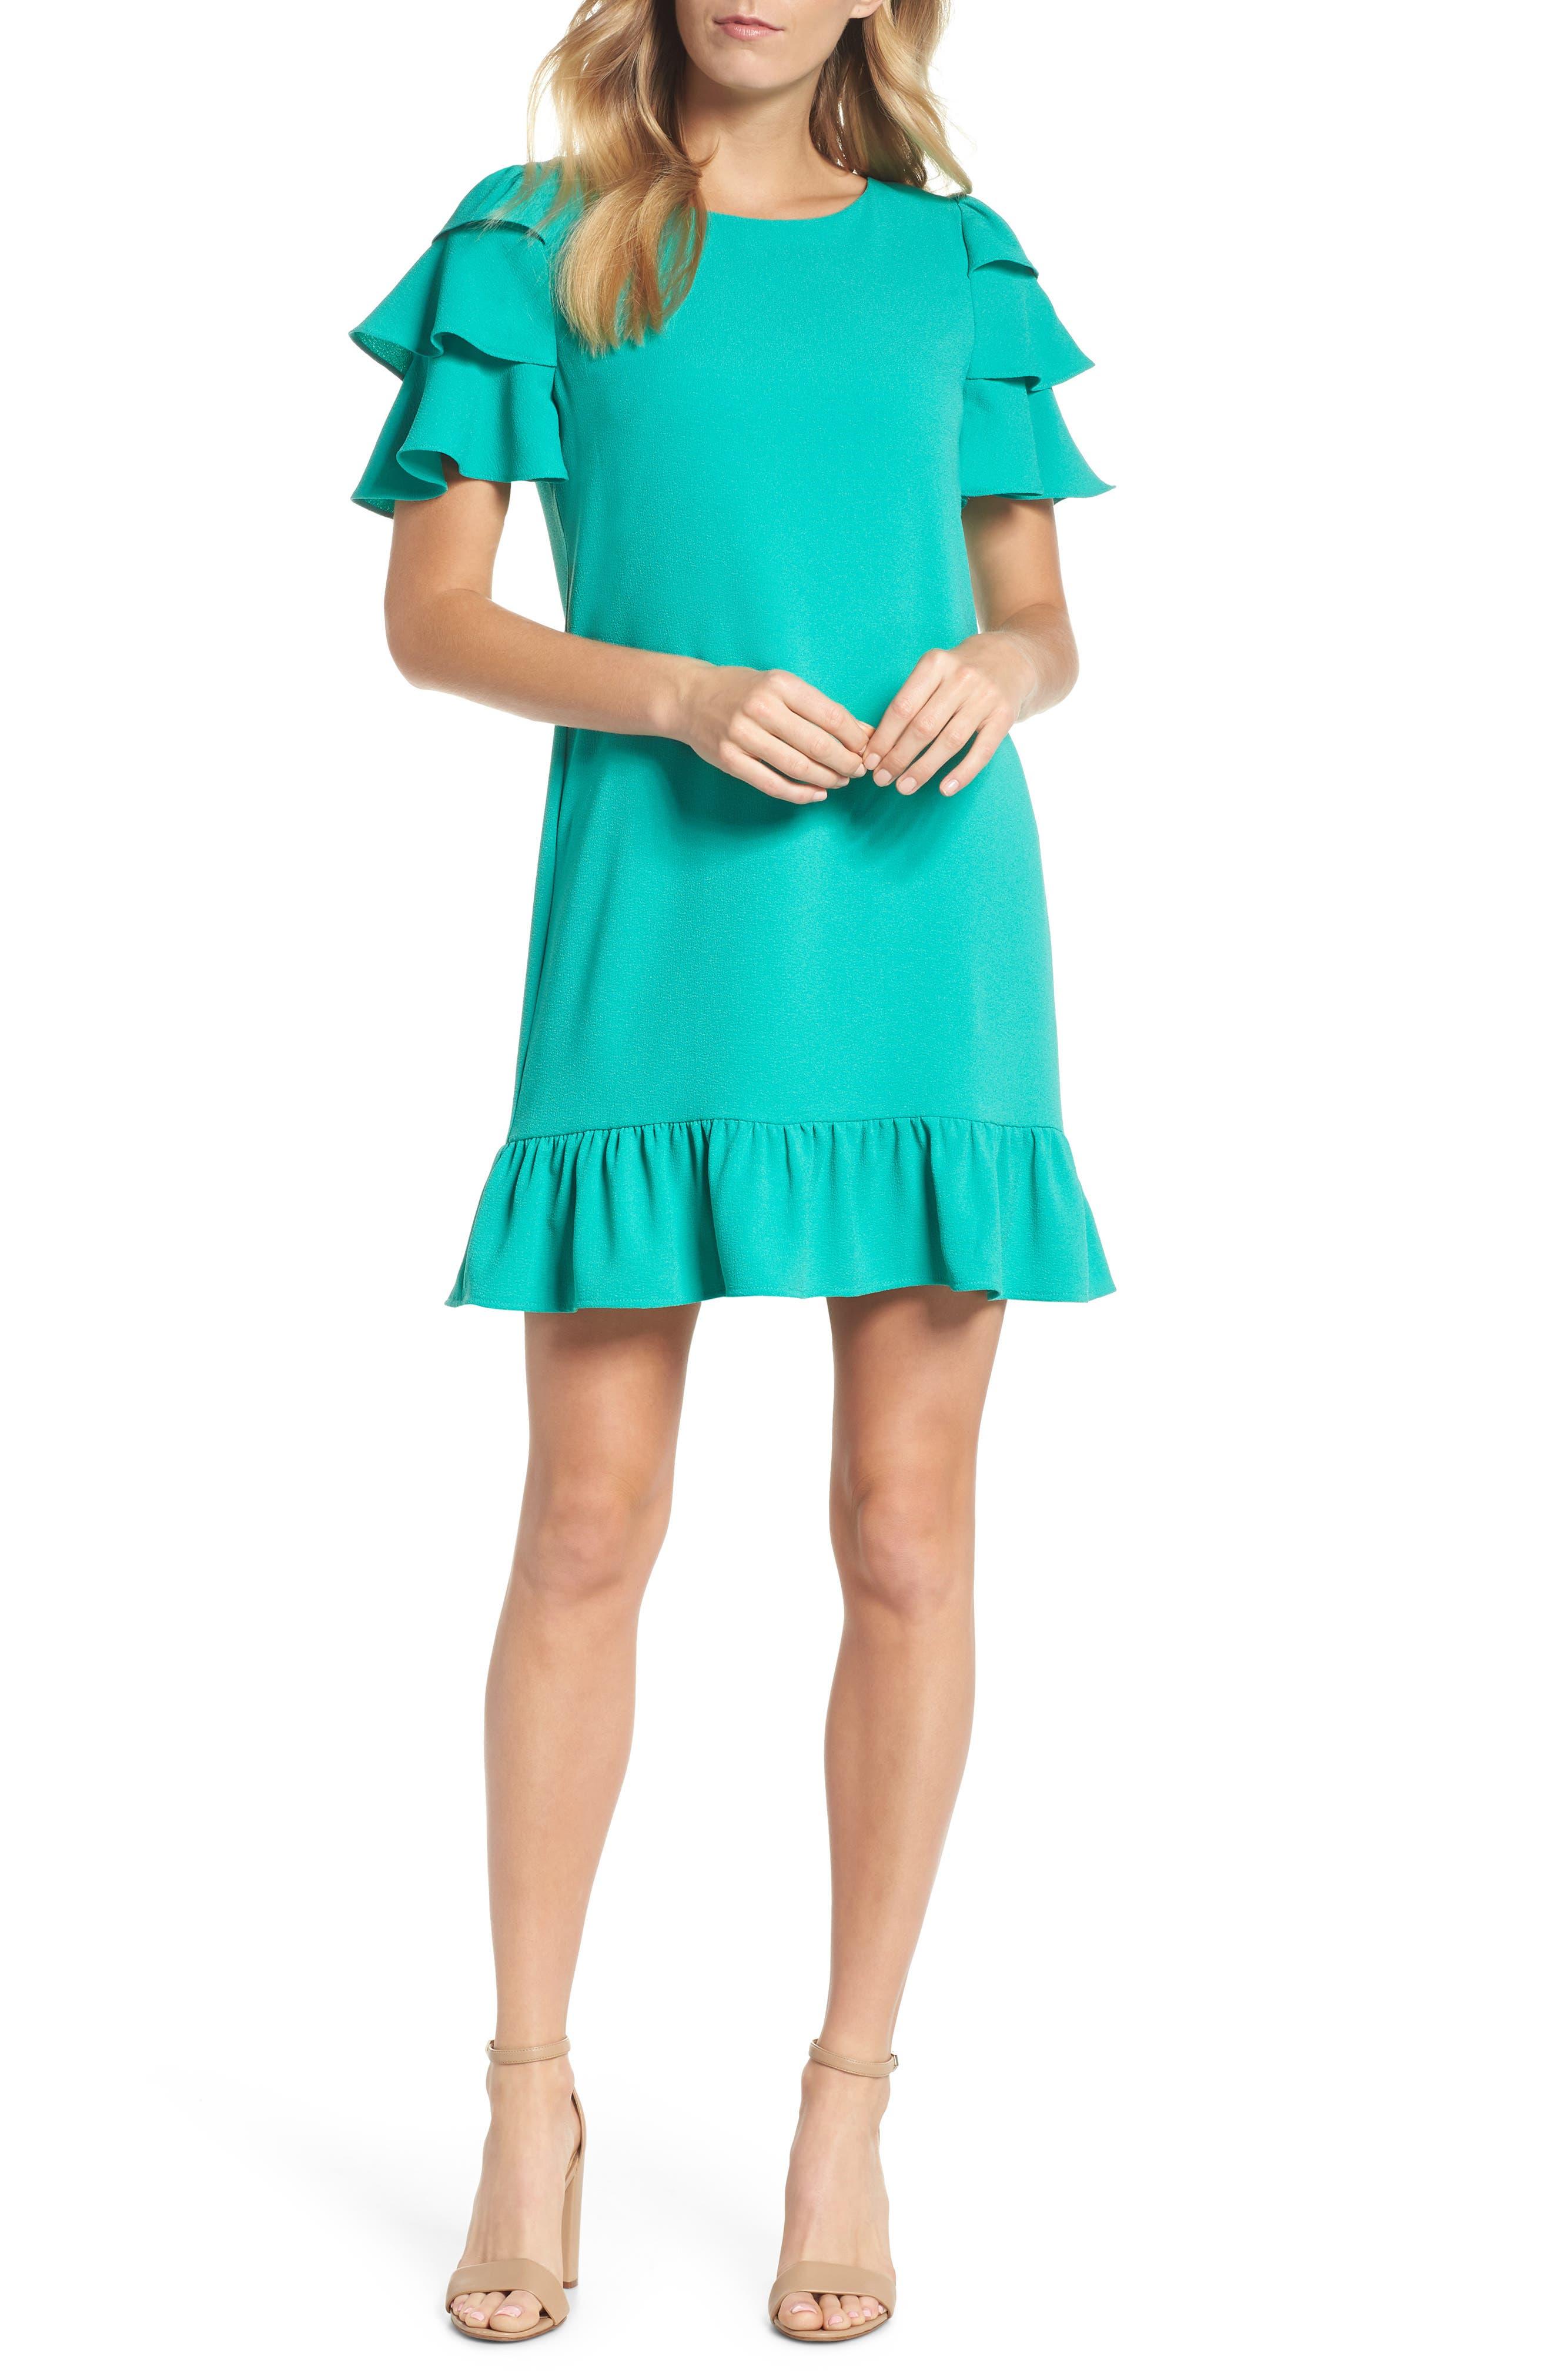 Alternate Image 1 Selected - Charles Henry Tiered Ruffle Shift Dress (Regular & Petite)